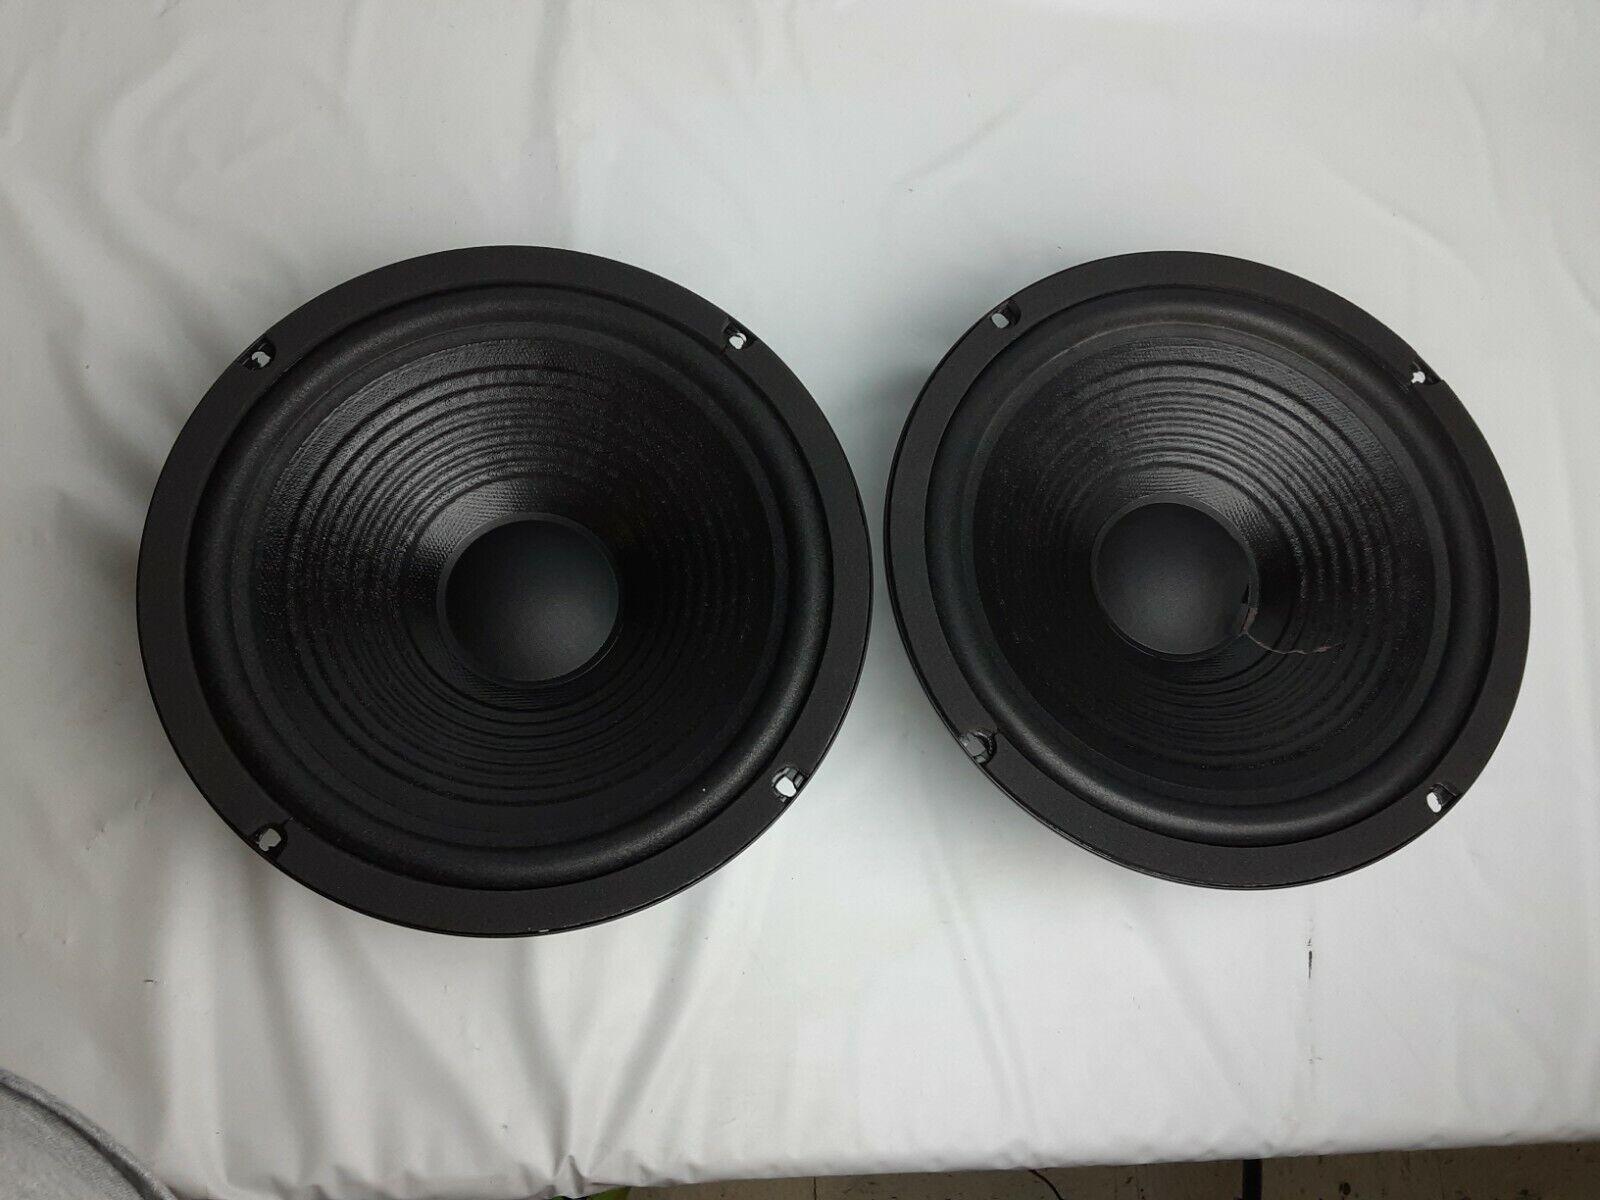 "s l1600 - 2 JBL Model 510G 10"" 8 Ohm Midrange Speakers P/N 70107 / G400, 4800, 3800, 8330"